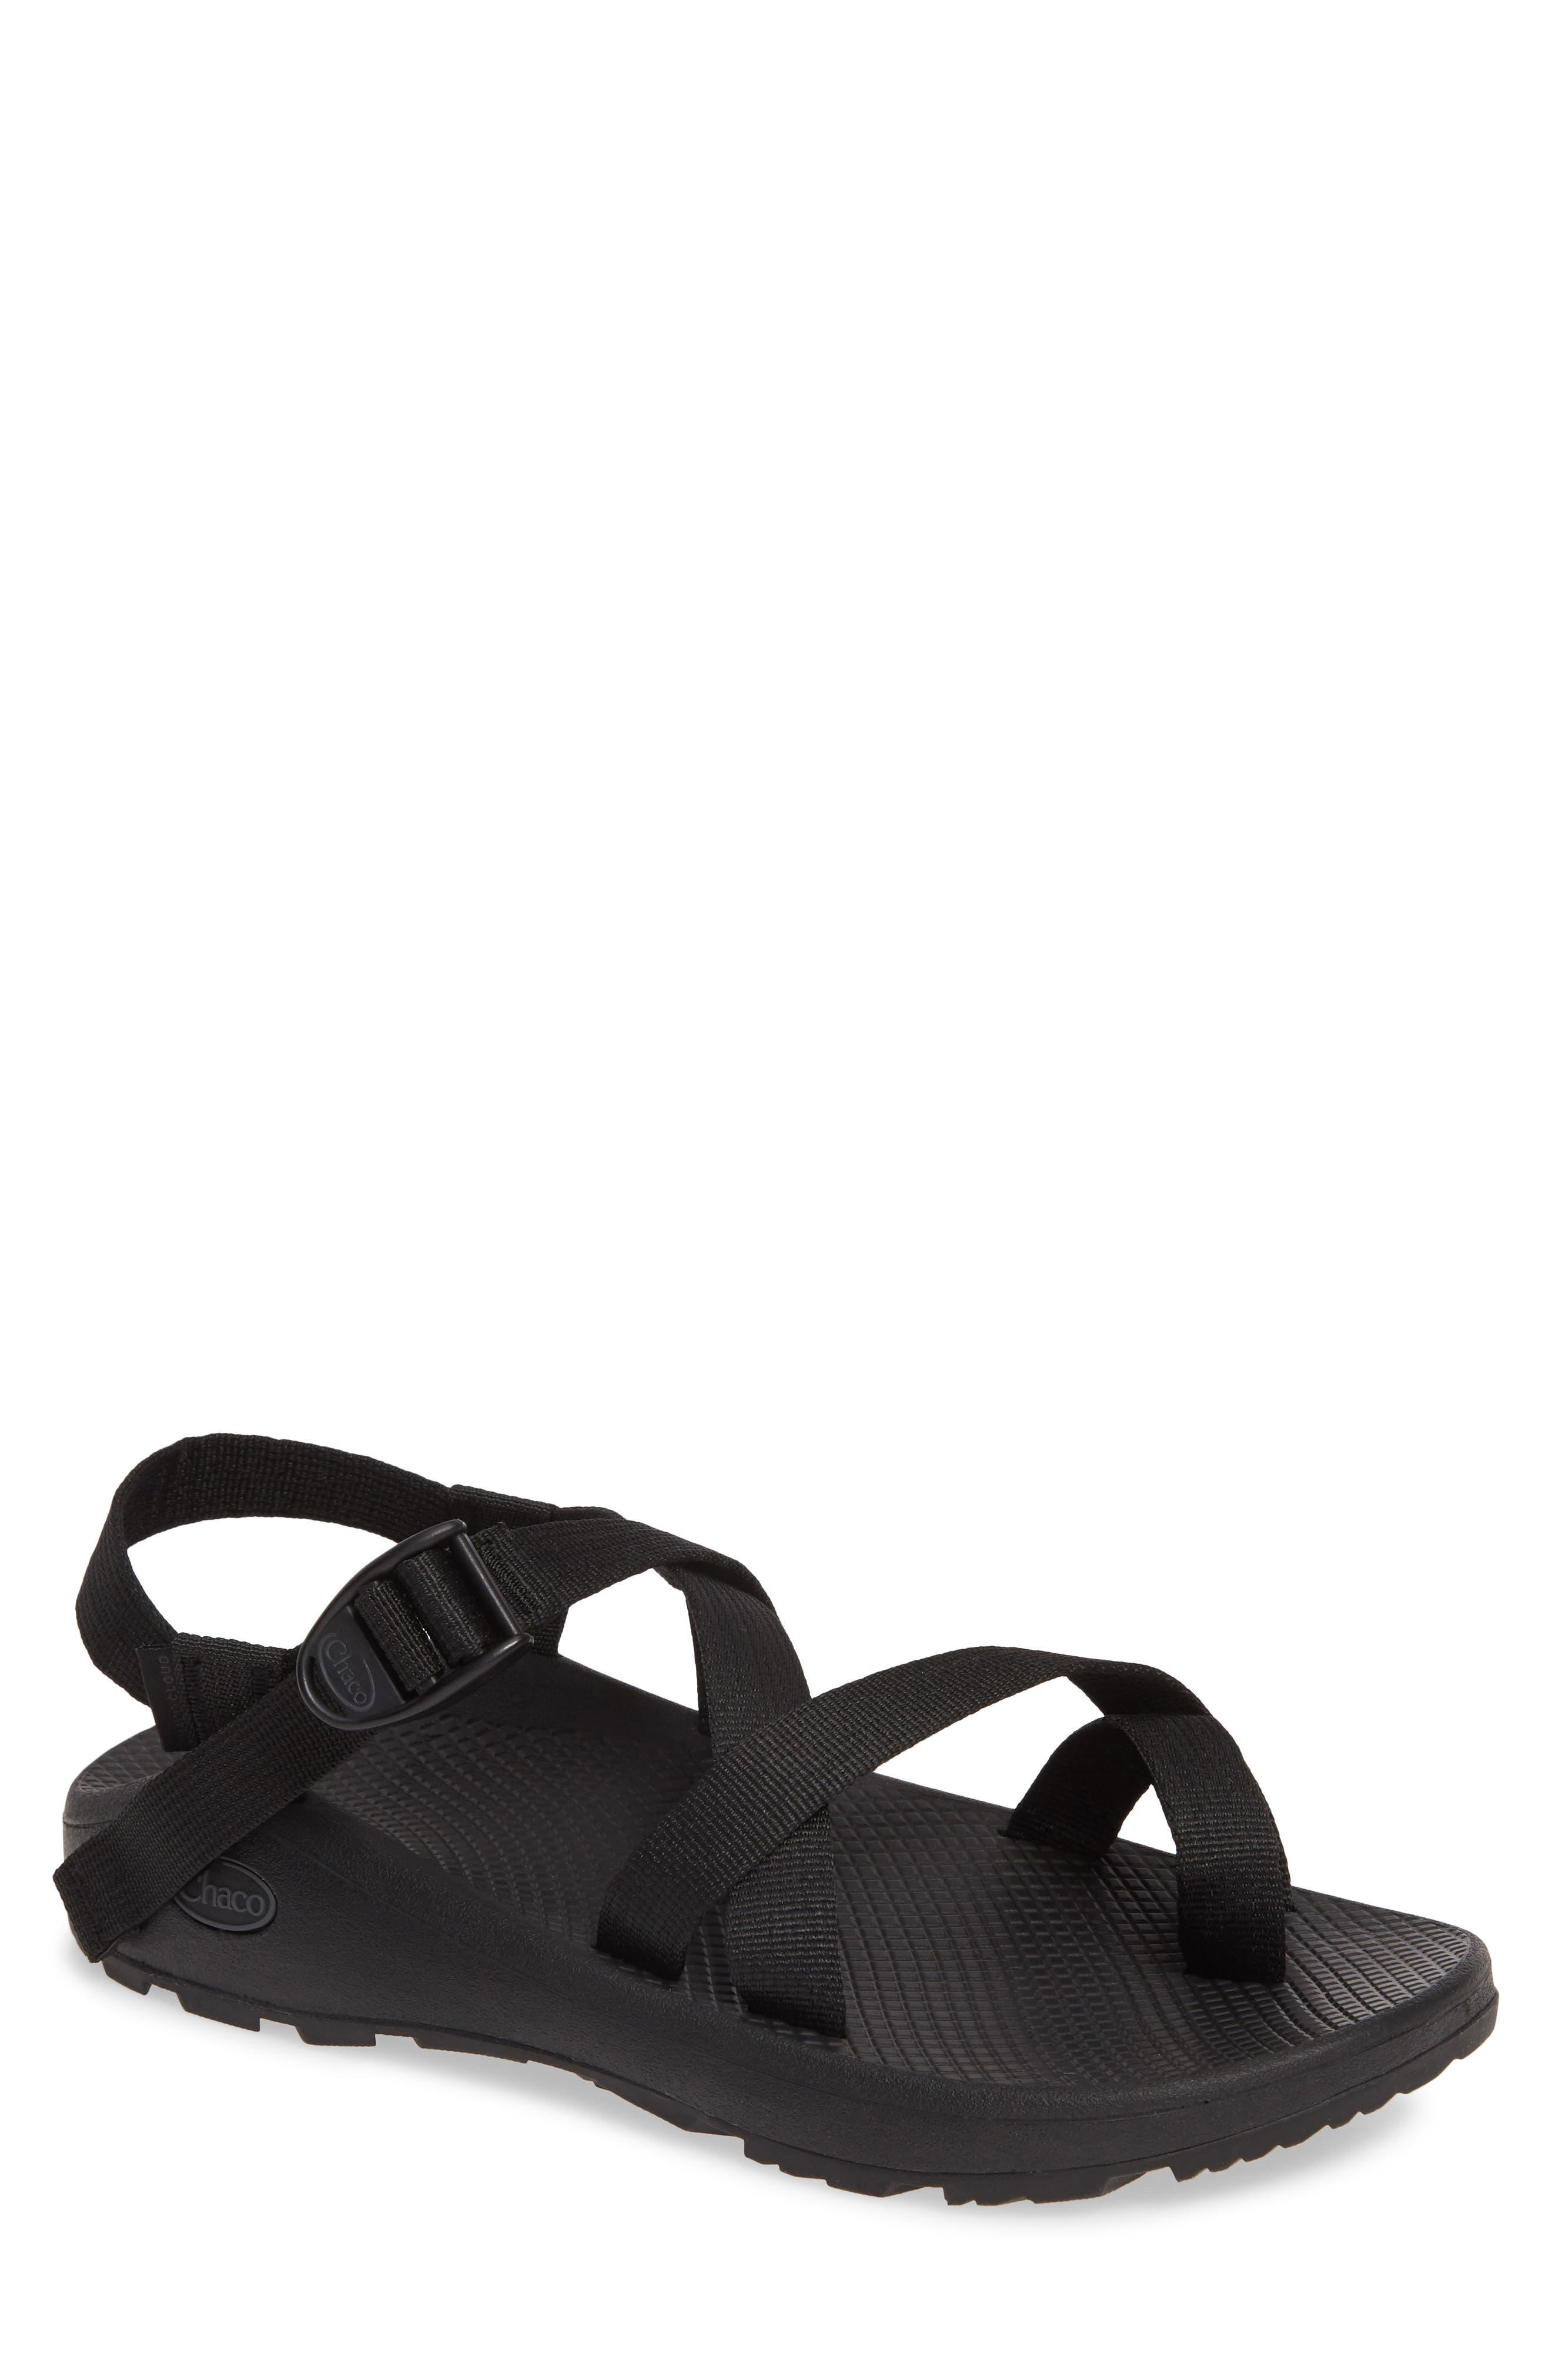 Z/cloud 2 Sport Sandal